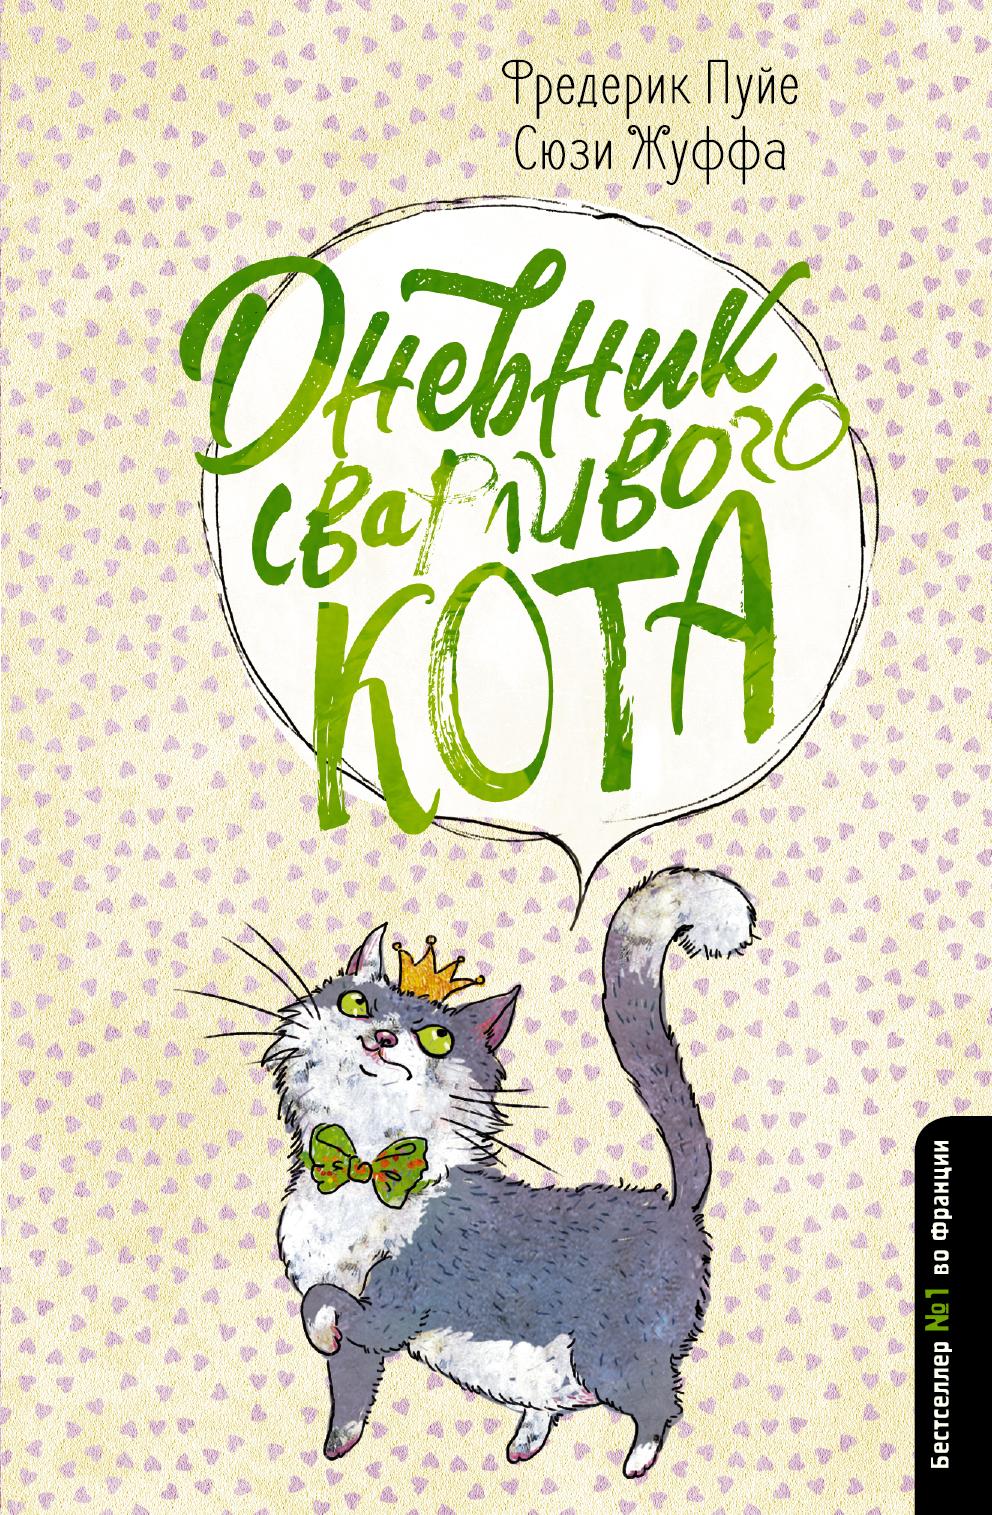 Дневник сварливого кота ( Пуйе Фредерик, Жуффа Сюзи  )